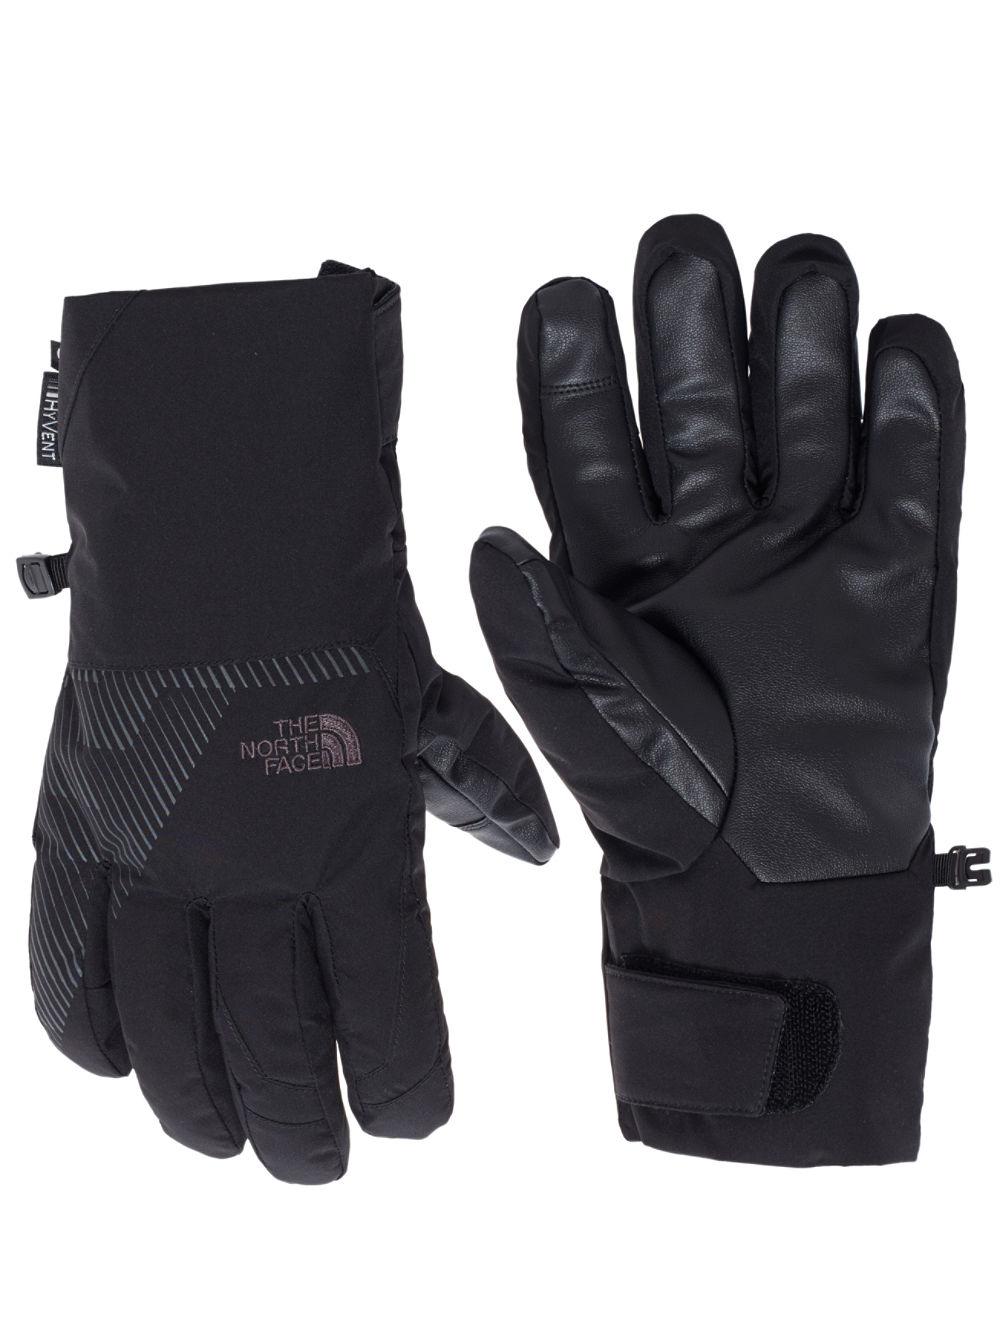 bab7b8798 Guardian Etip Gloves